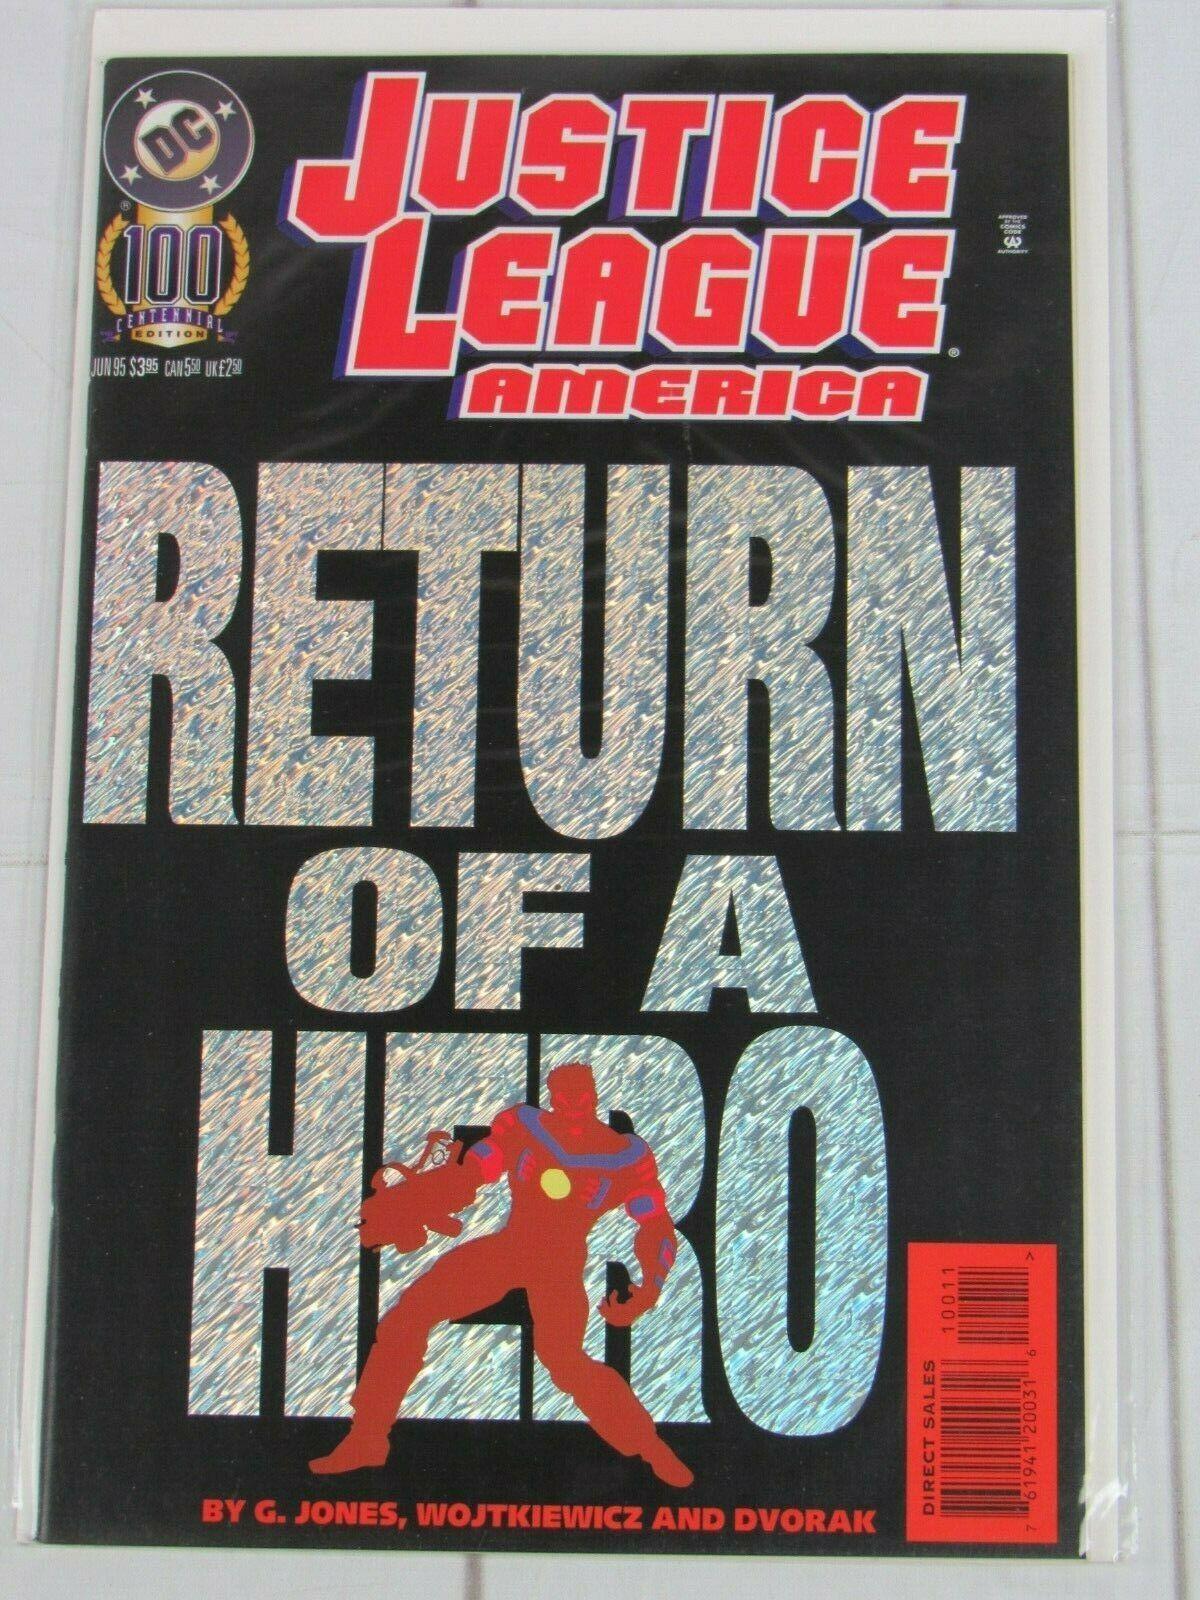 JUSTICE LEAGUE OF AMERICA #100 VOL 2 JLA DC HOLO COVER JUNE 1995 - C4979